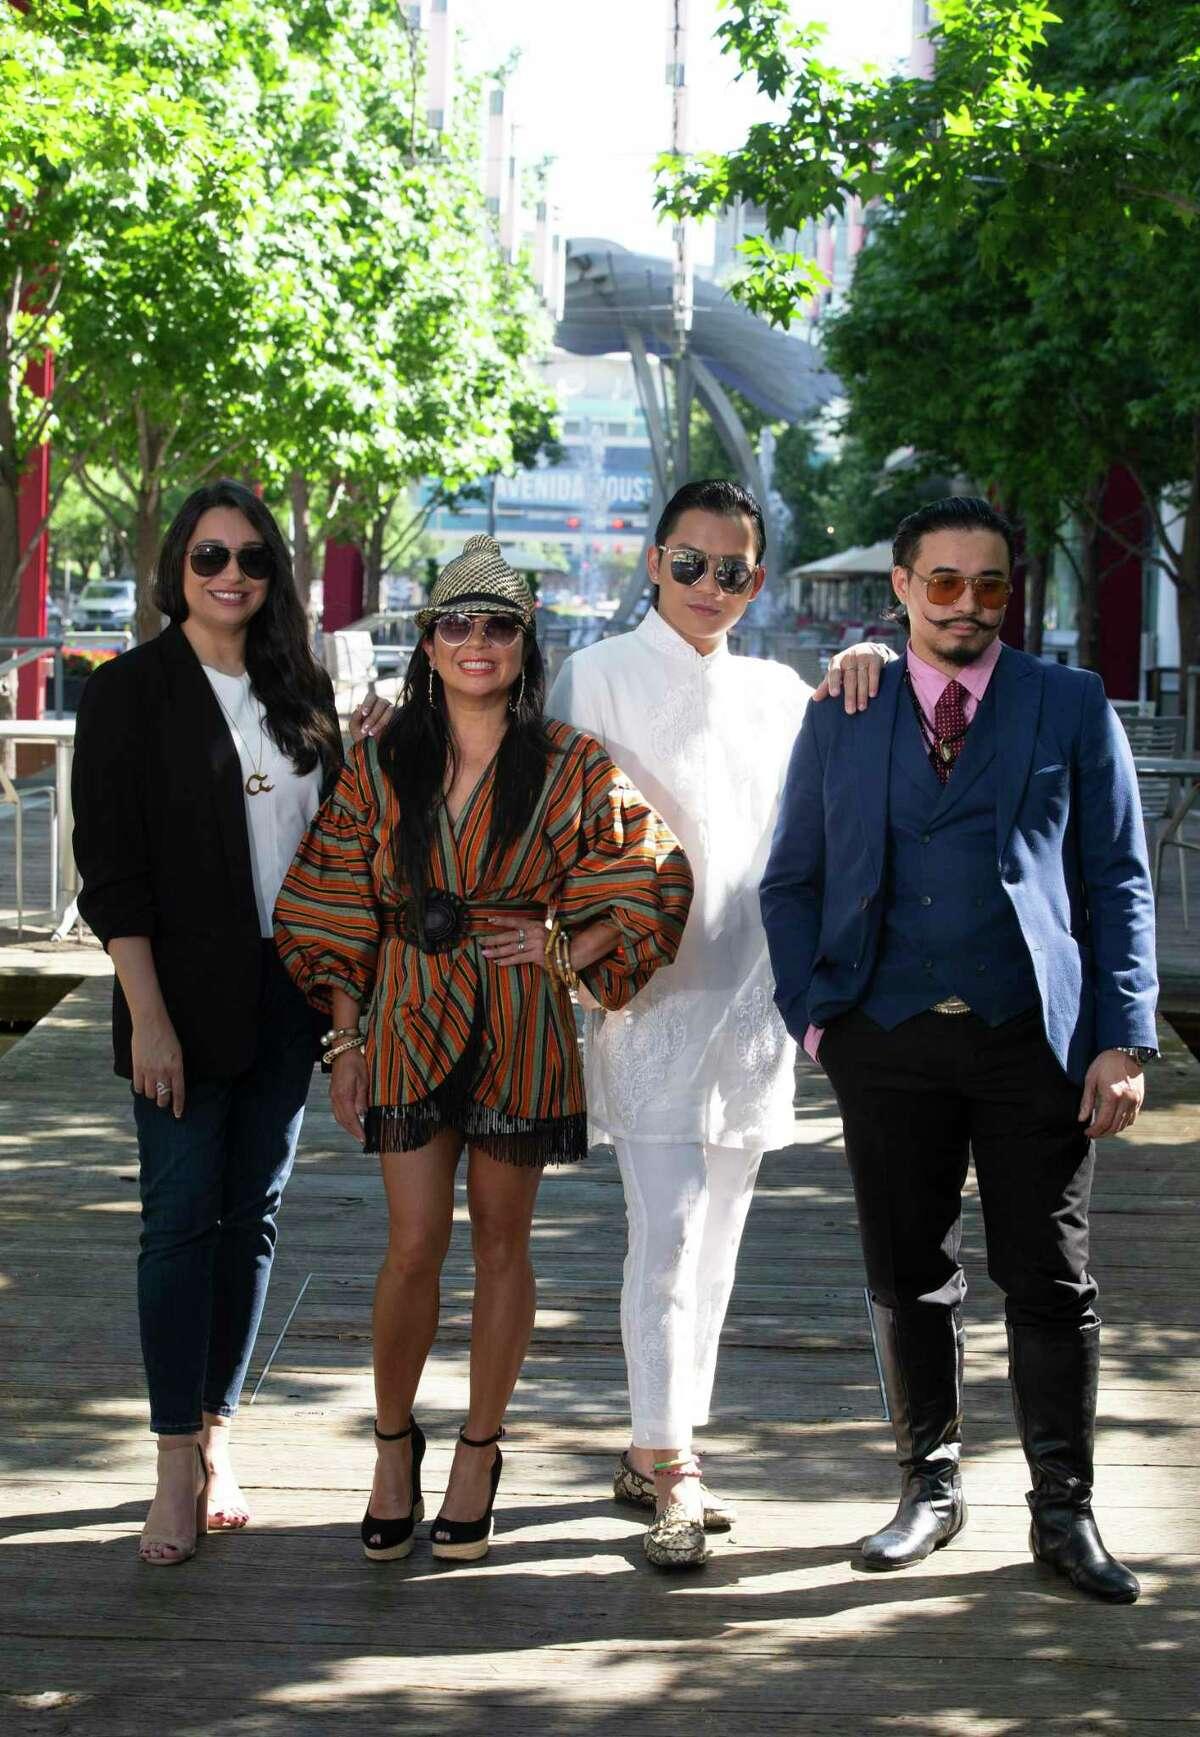 Designers Sameera Faridi, from left, Tina Zulu, Danny Nguyen and Nicholas Phan Nguyen